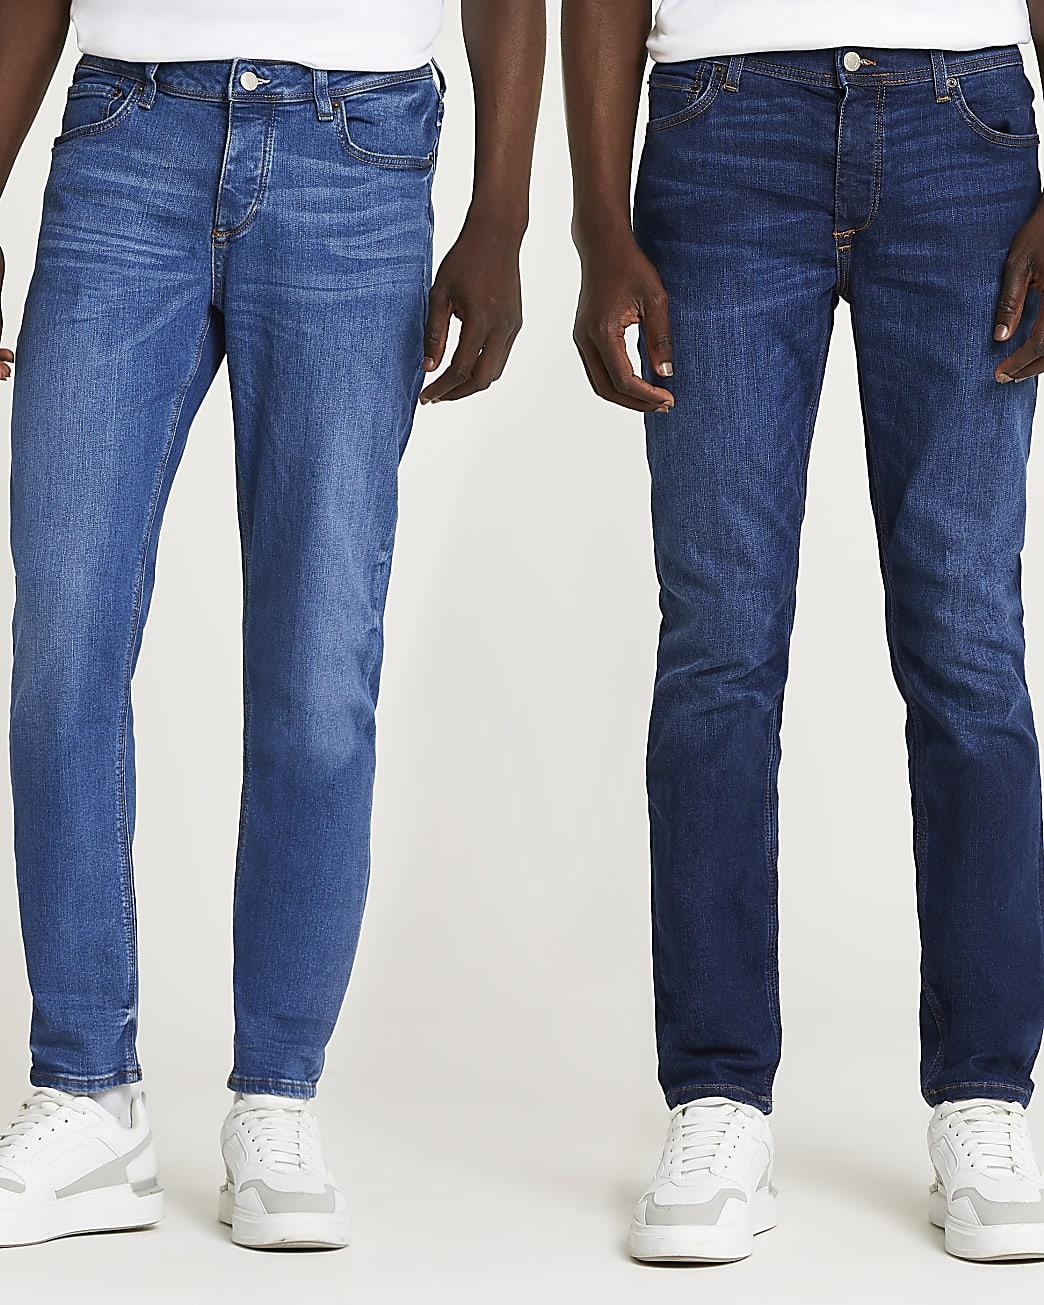 Blue slim fit jeans 2 pack